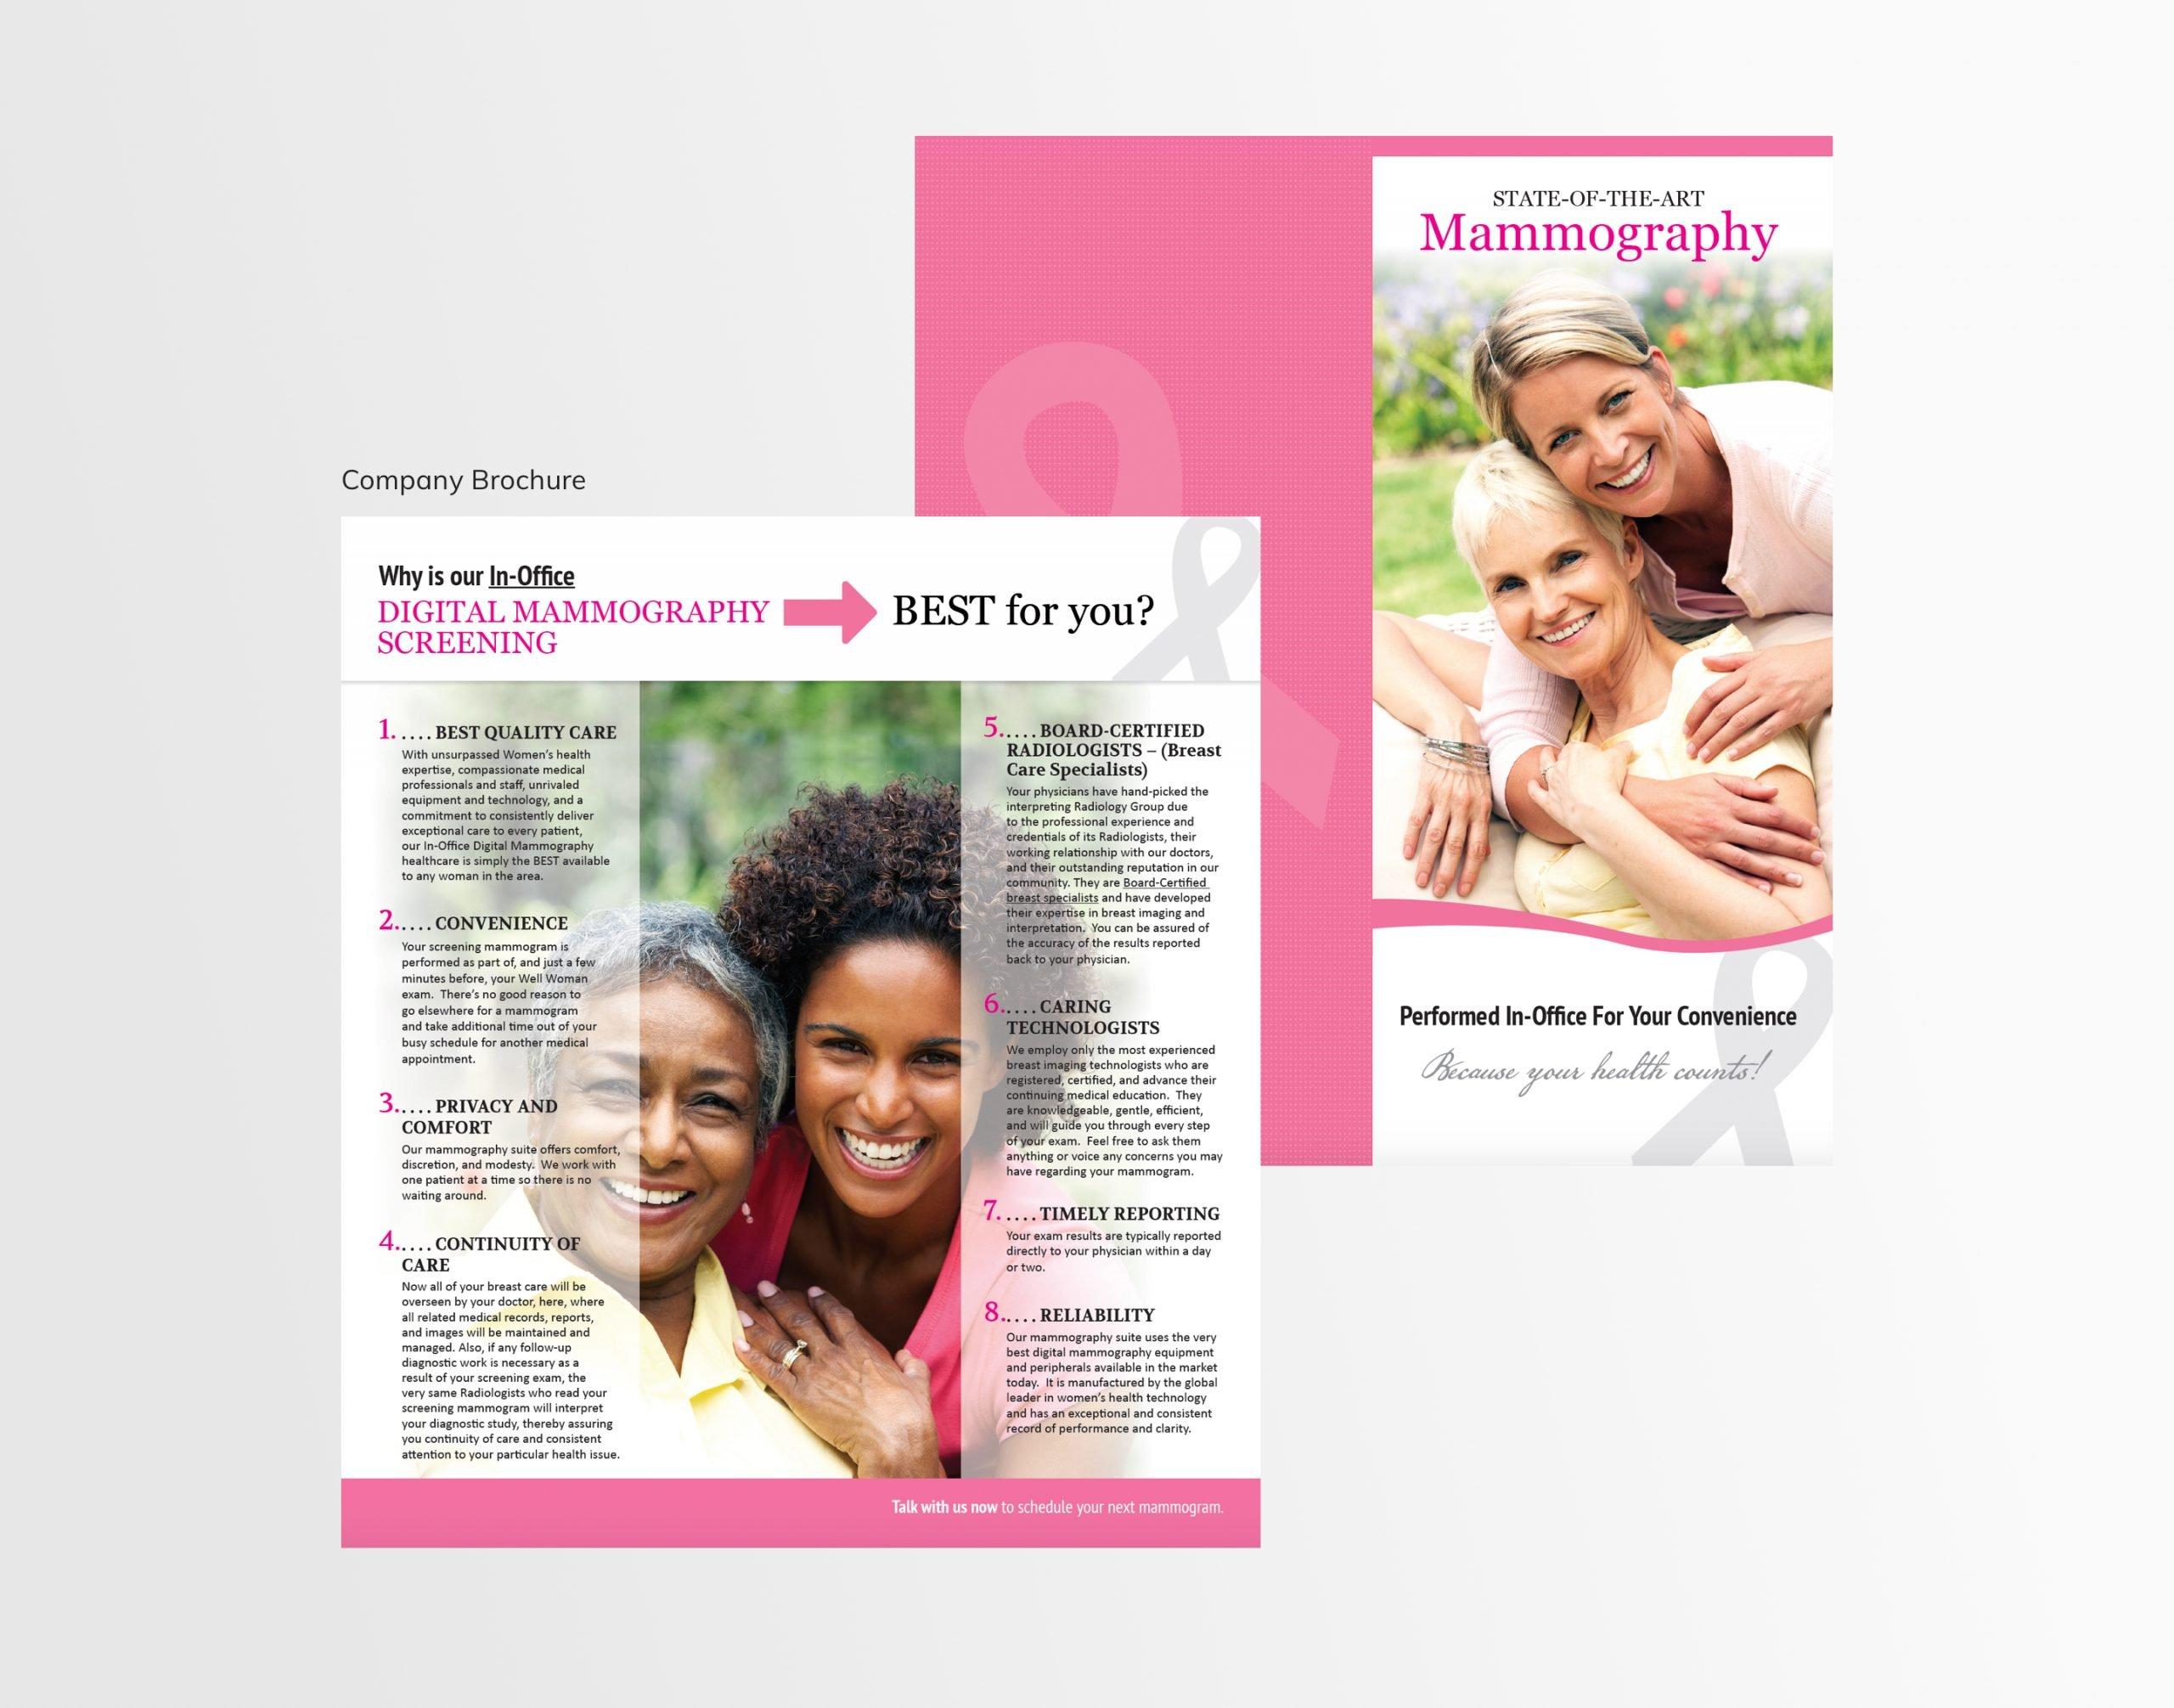 Onsite Mammography Company Brochure